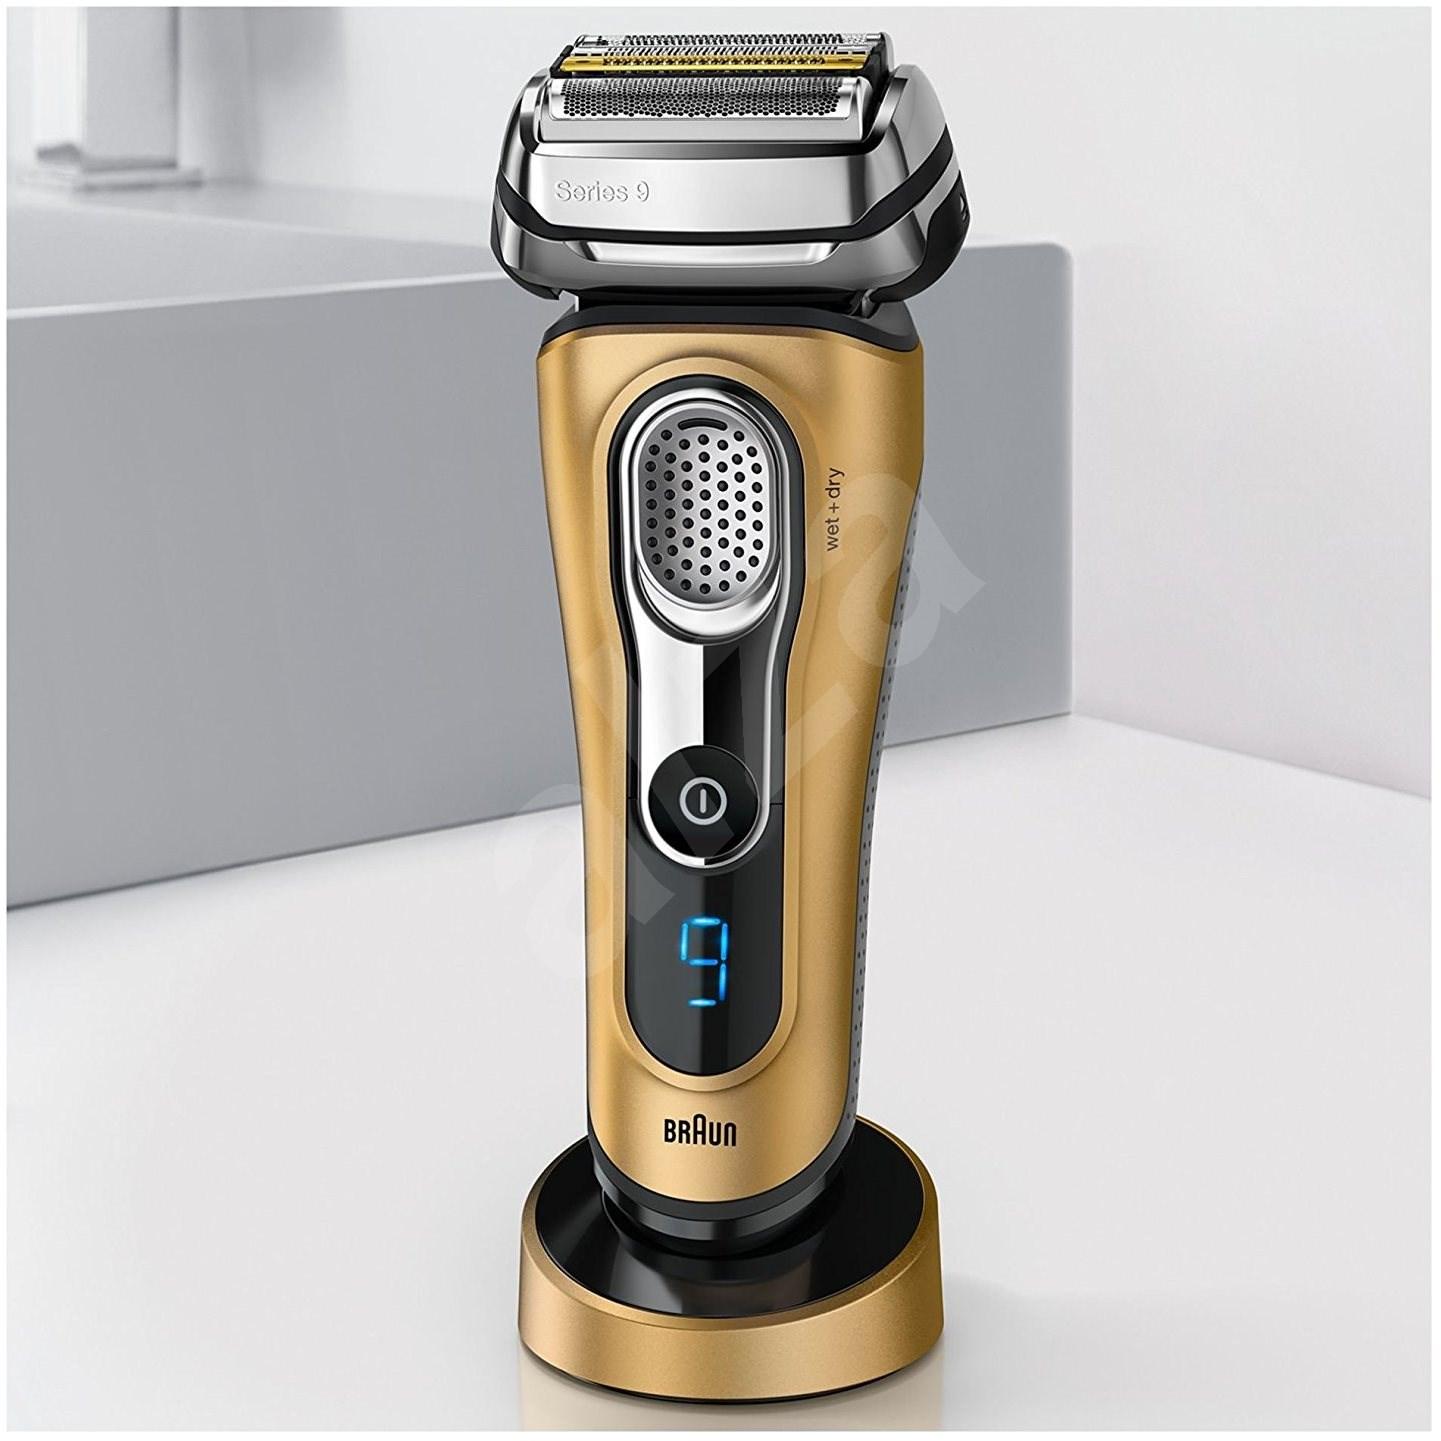 braun series 9 9299s electric shaver. Black Bedroom Furniture Sets. Home Design Ideas